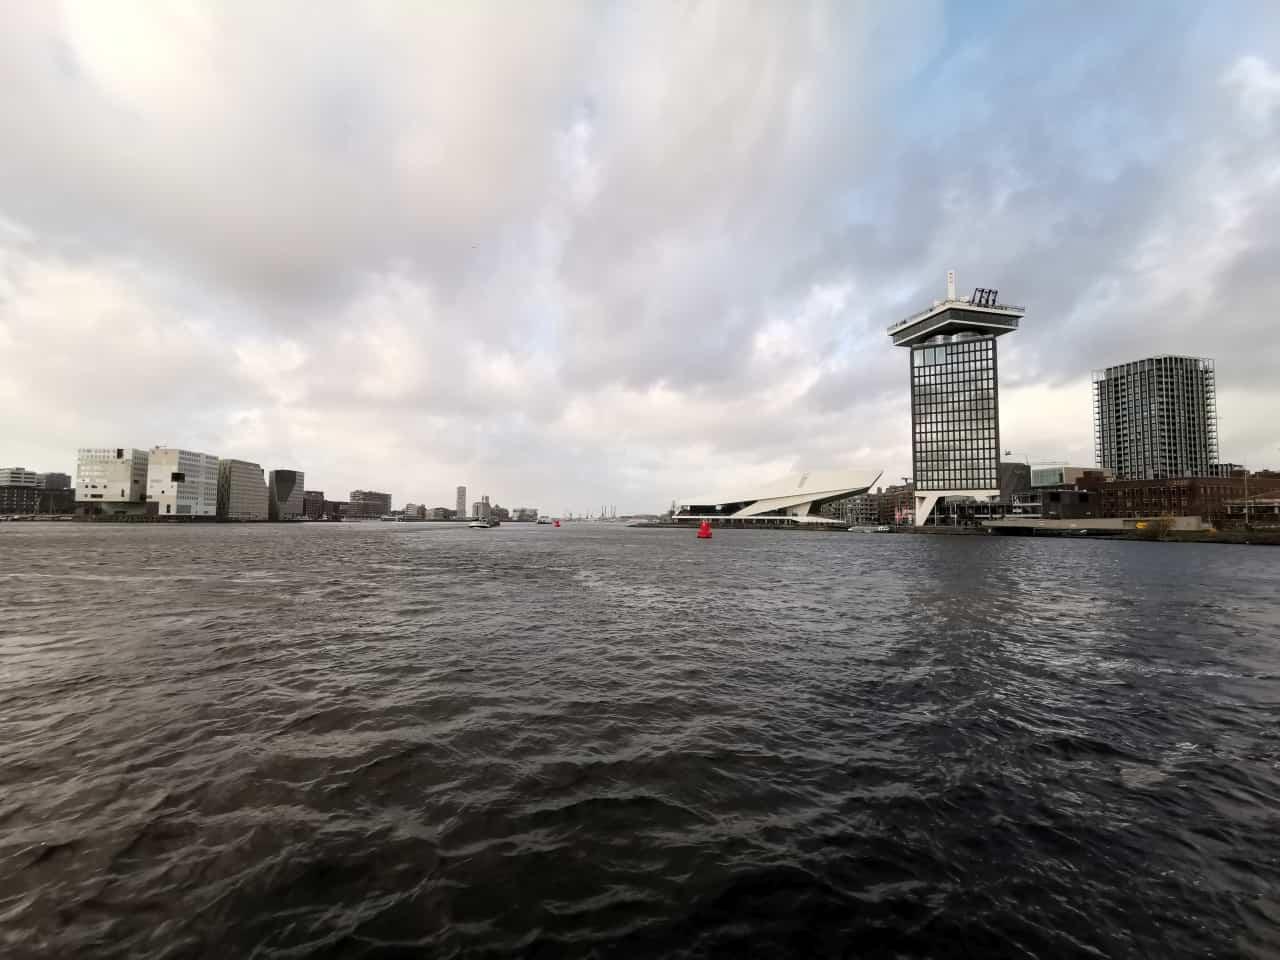 Nachmittag in Amsterdam